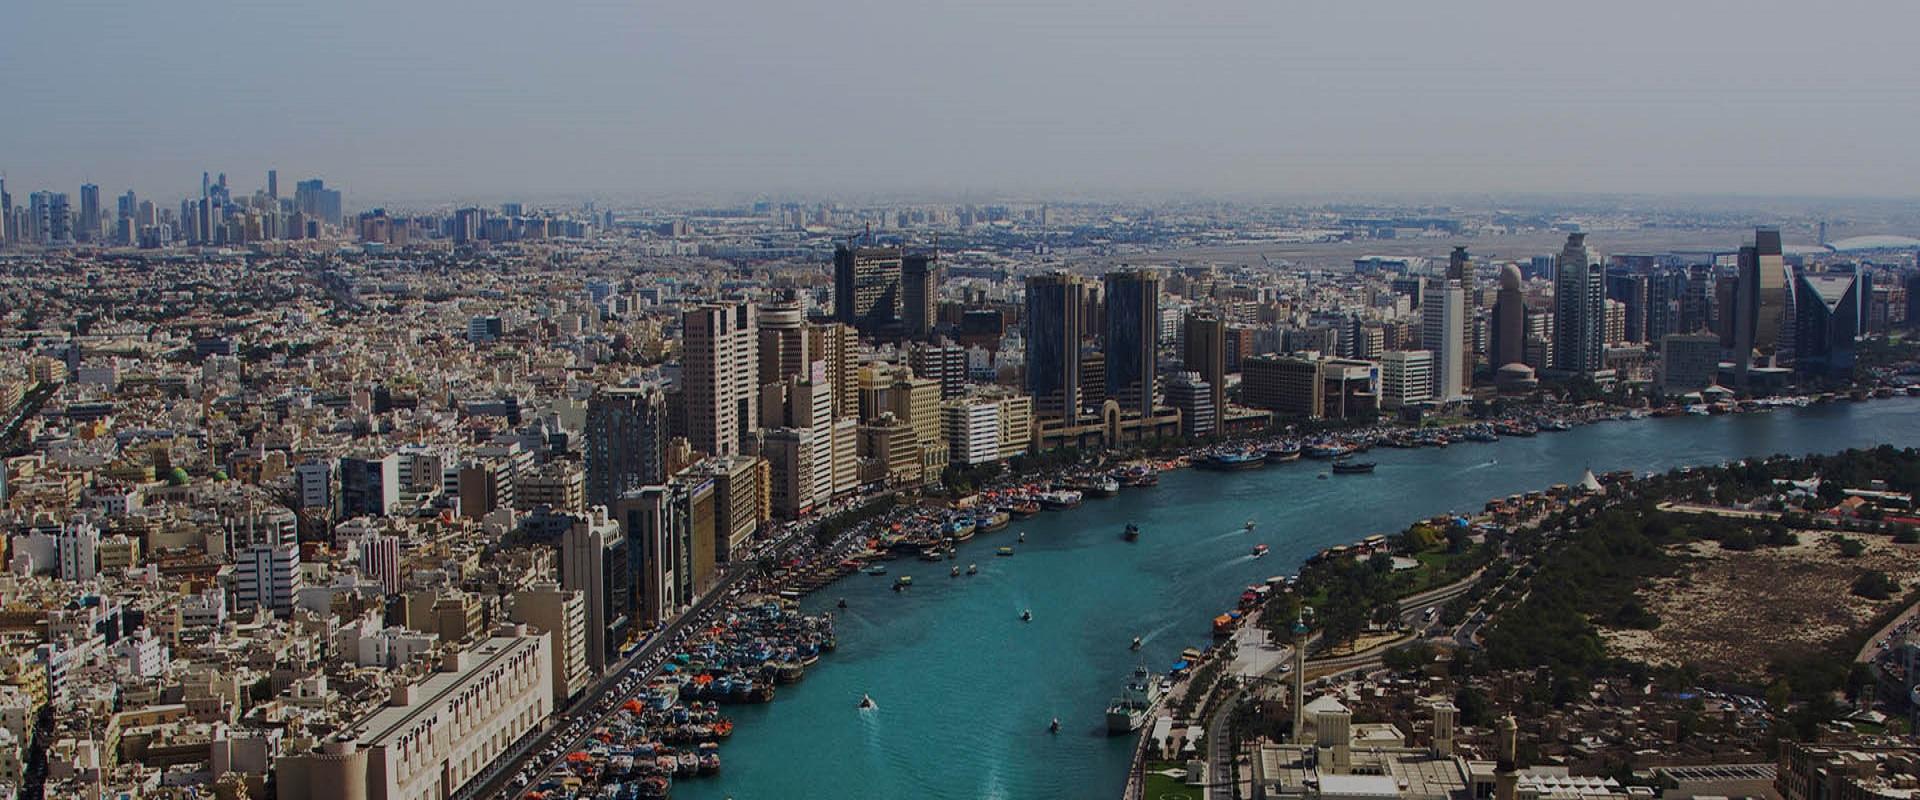 Dhow Cruise - Dubai Creek